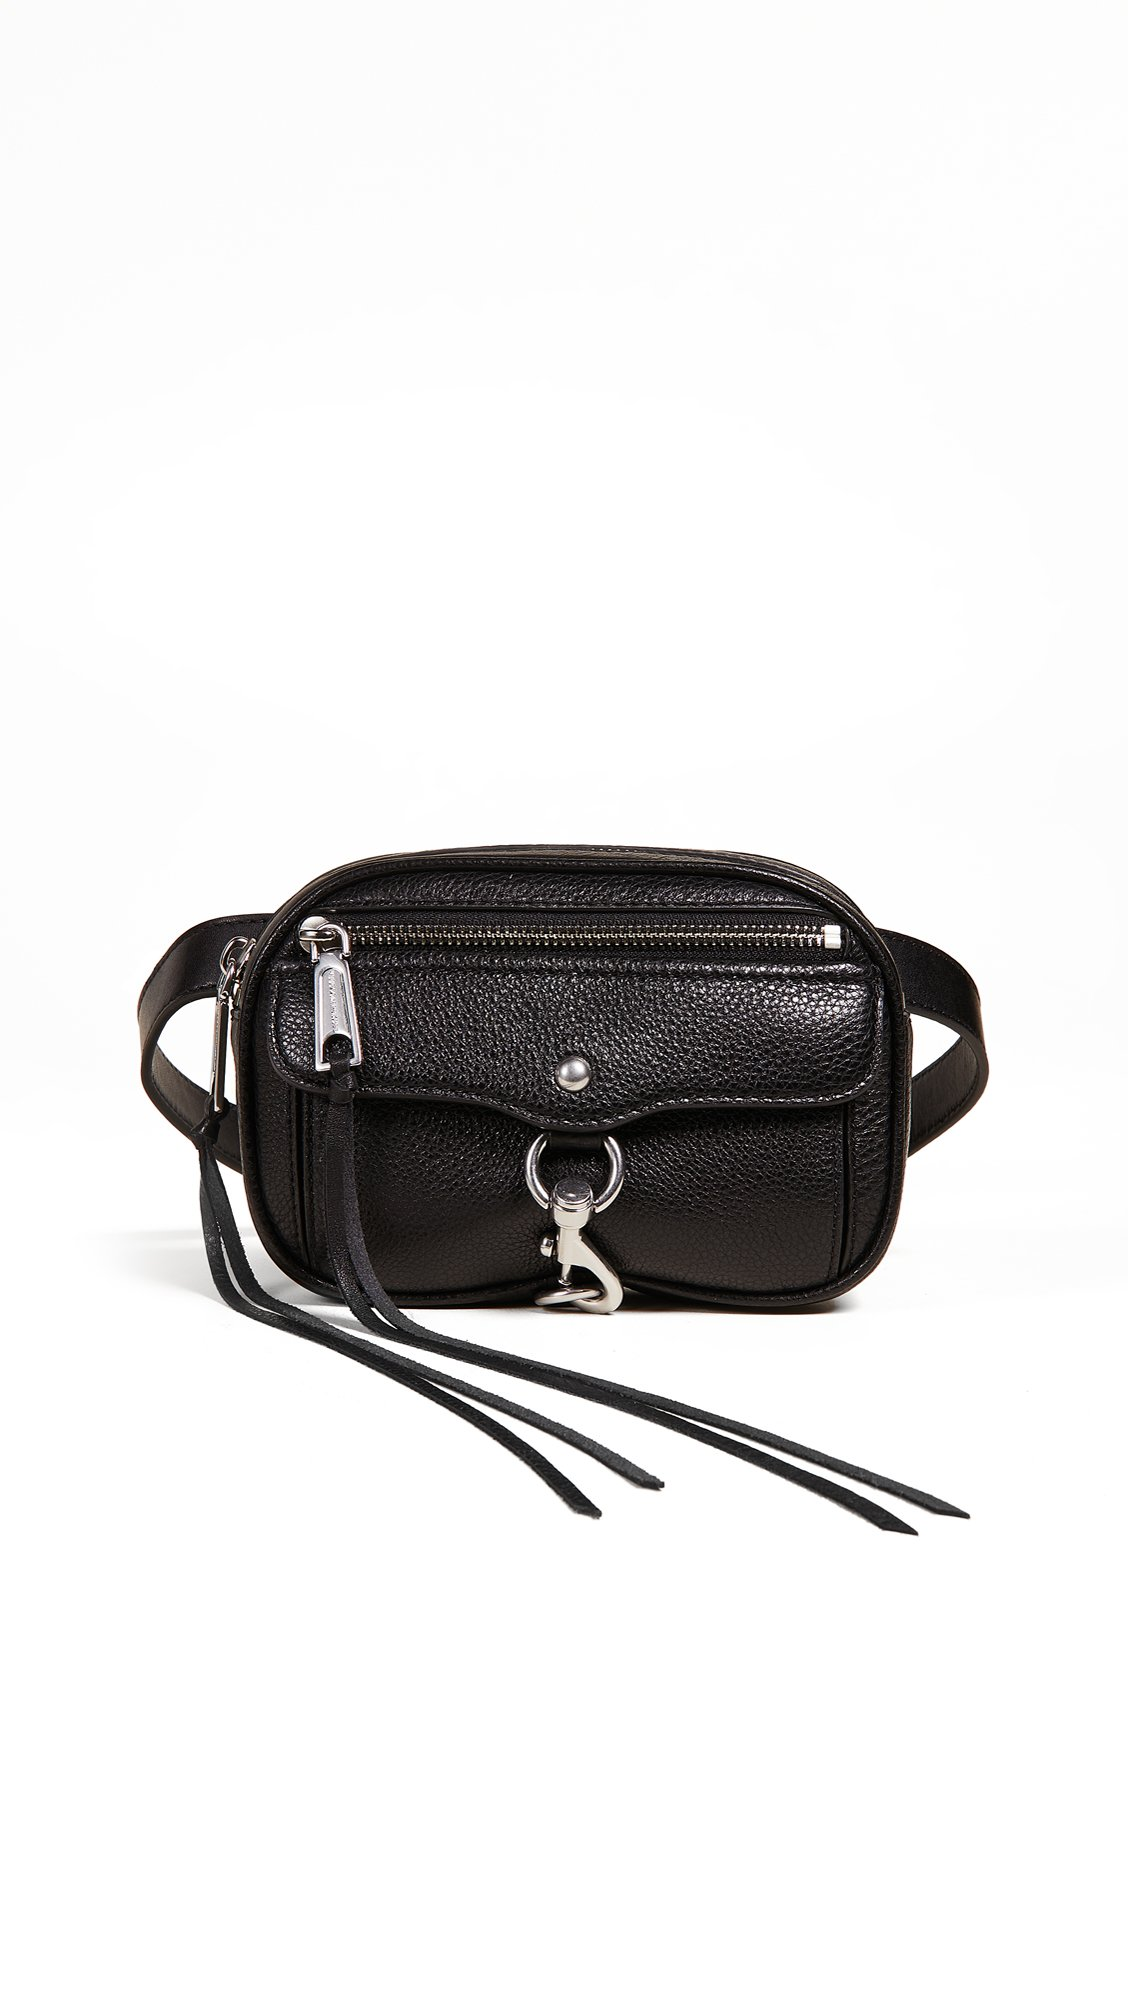 Rebecca Minkoff Women's Blythe Belt Bag, Black, One Size